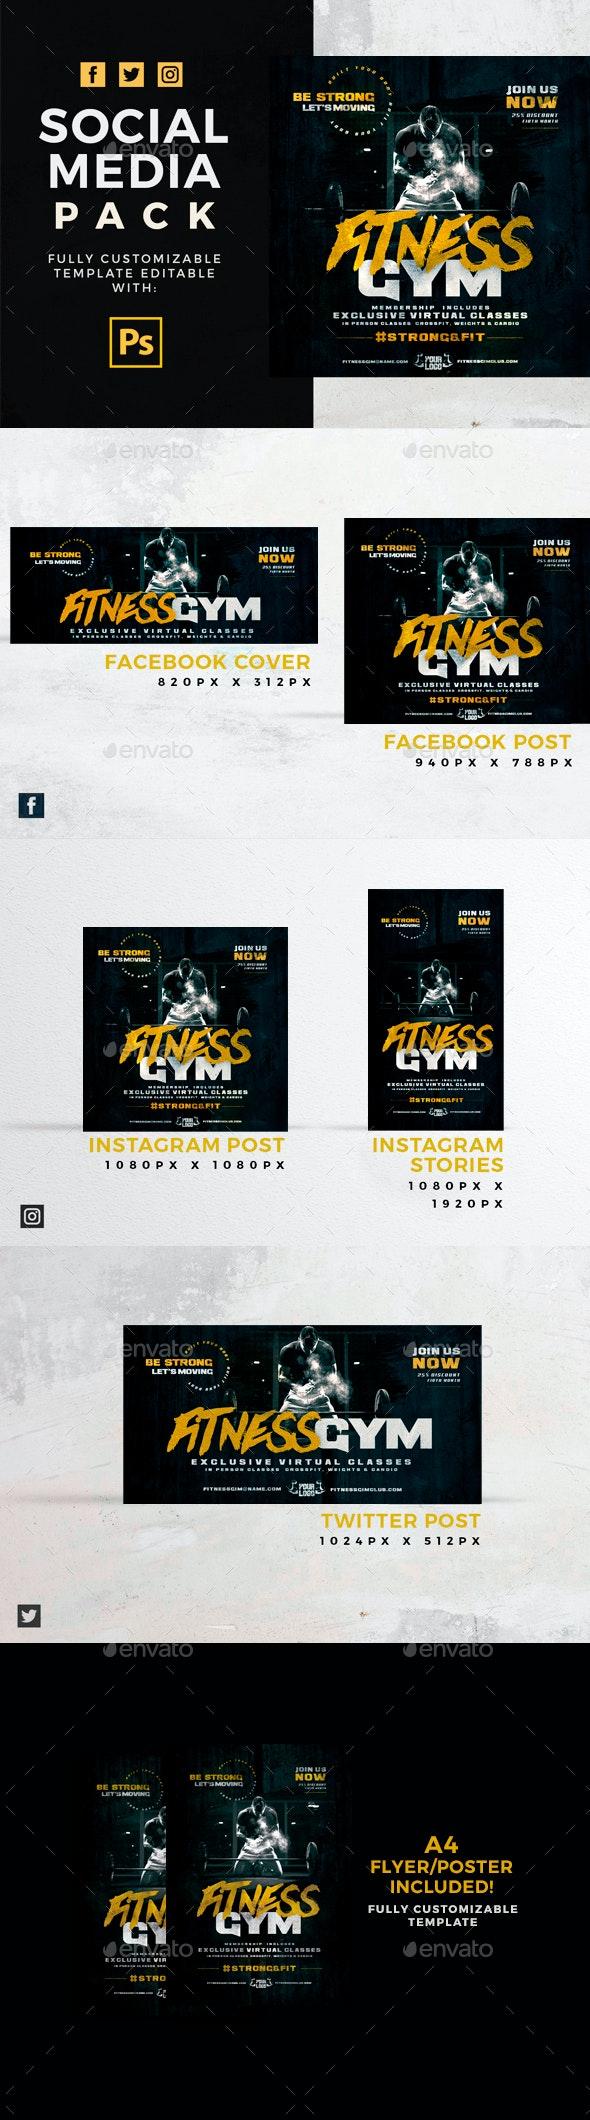 Fitness Gym Social Media Pack + Flyer Template - Social Media Web Elements